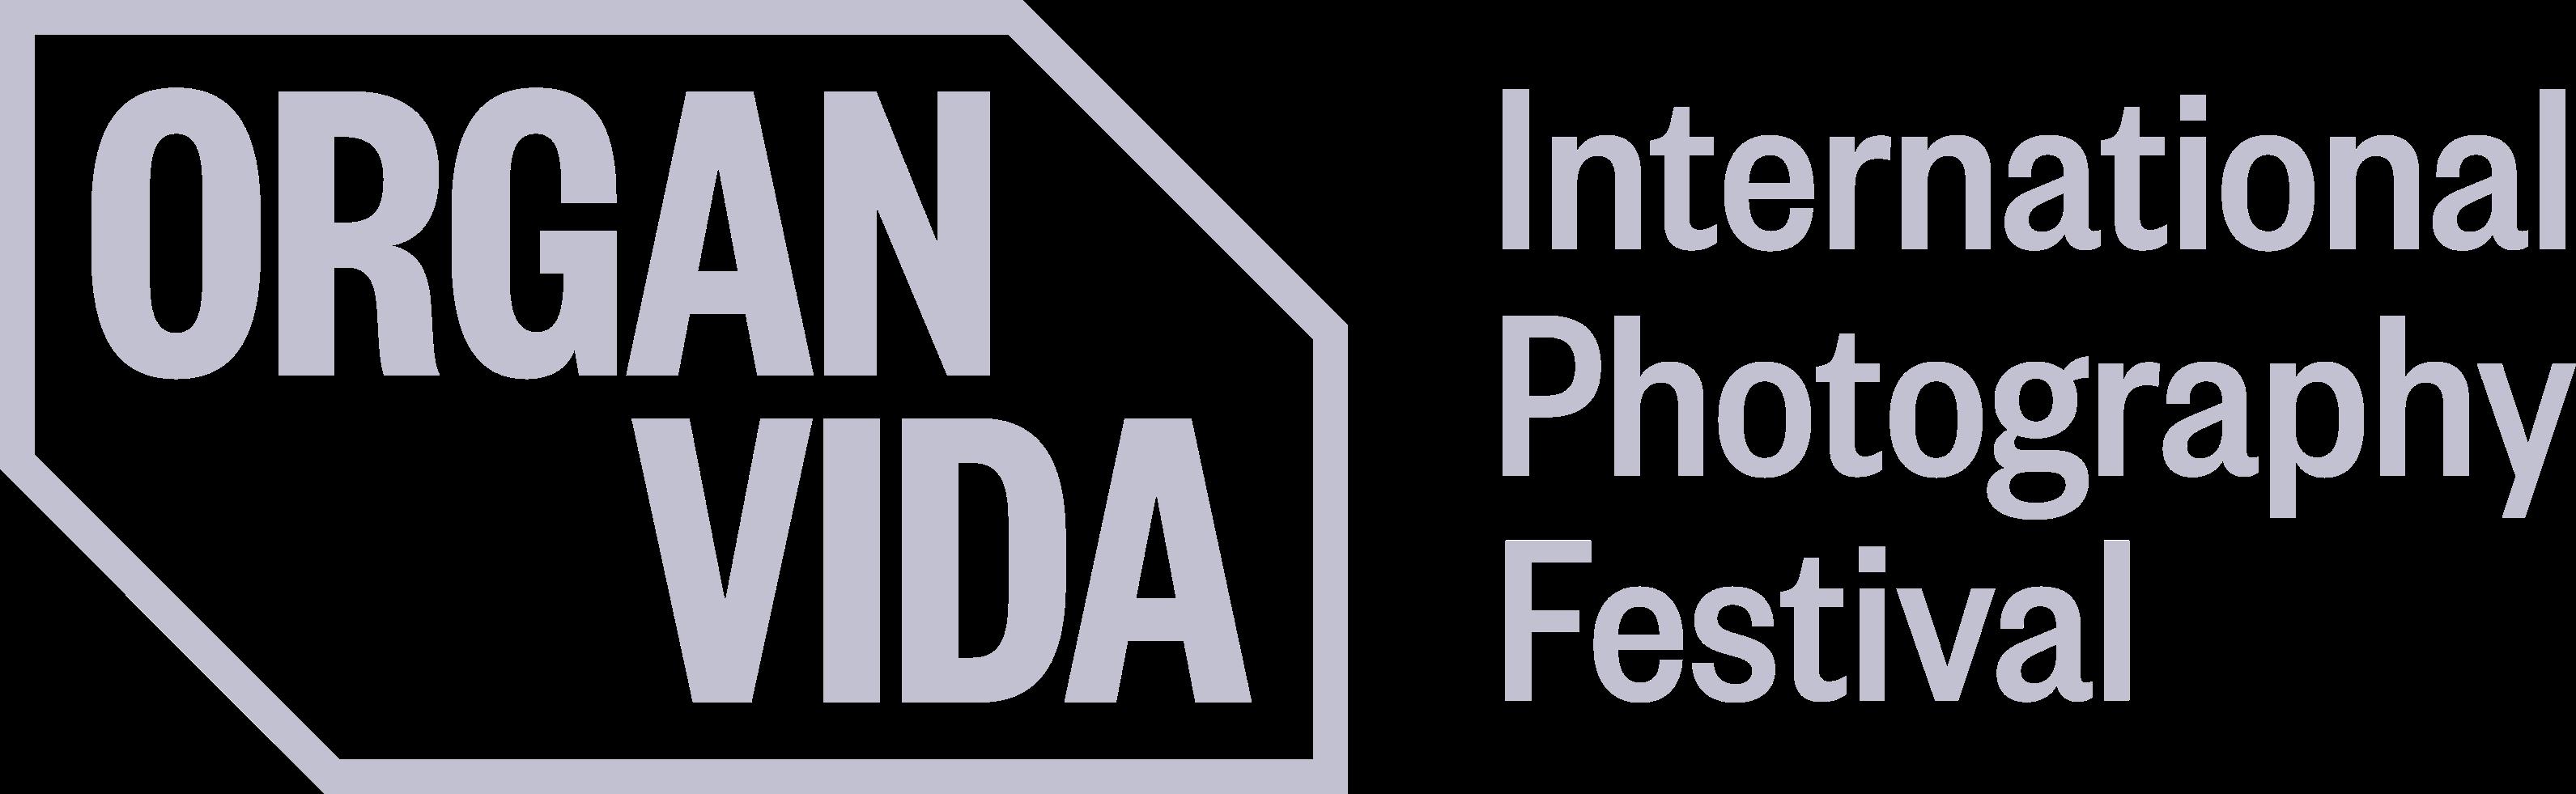 10th ORGAN VIDA International Photography Festival